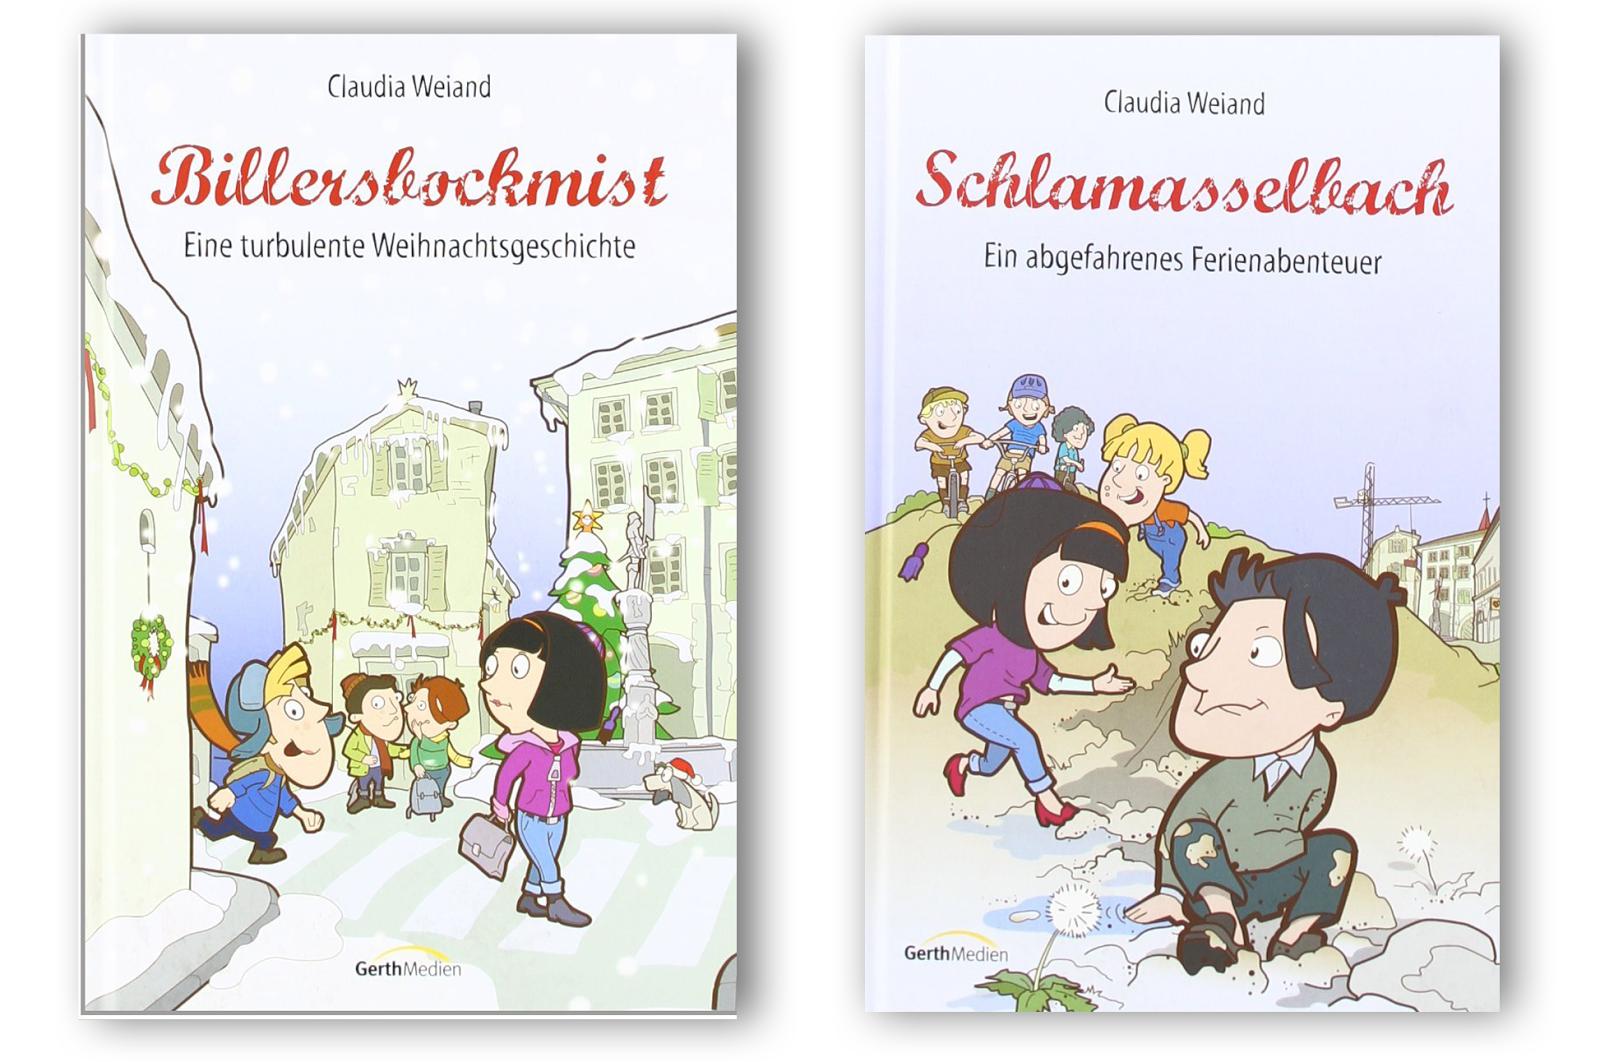 http://www.claudia-weiand.de/p/billersbockmist-schlamasselbach.html